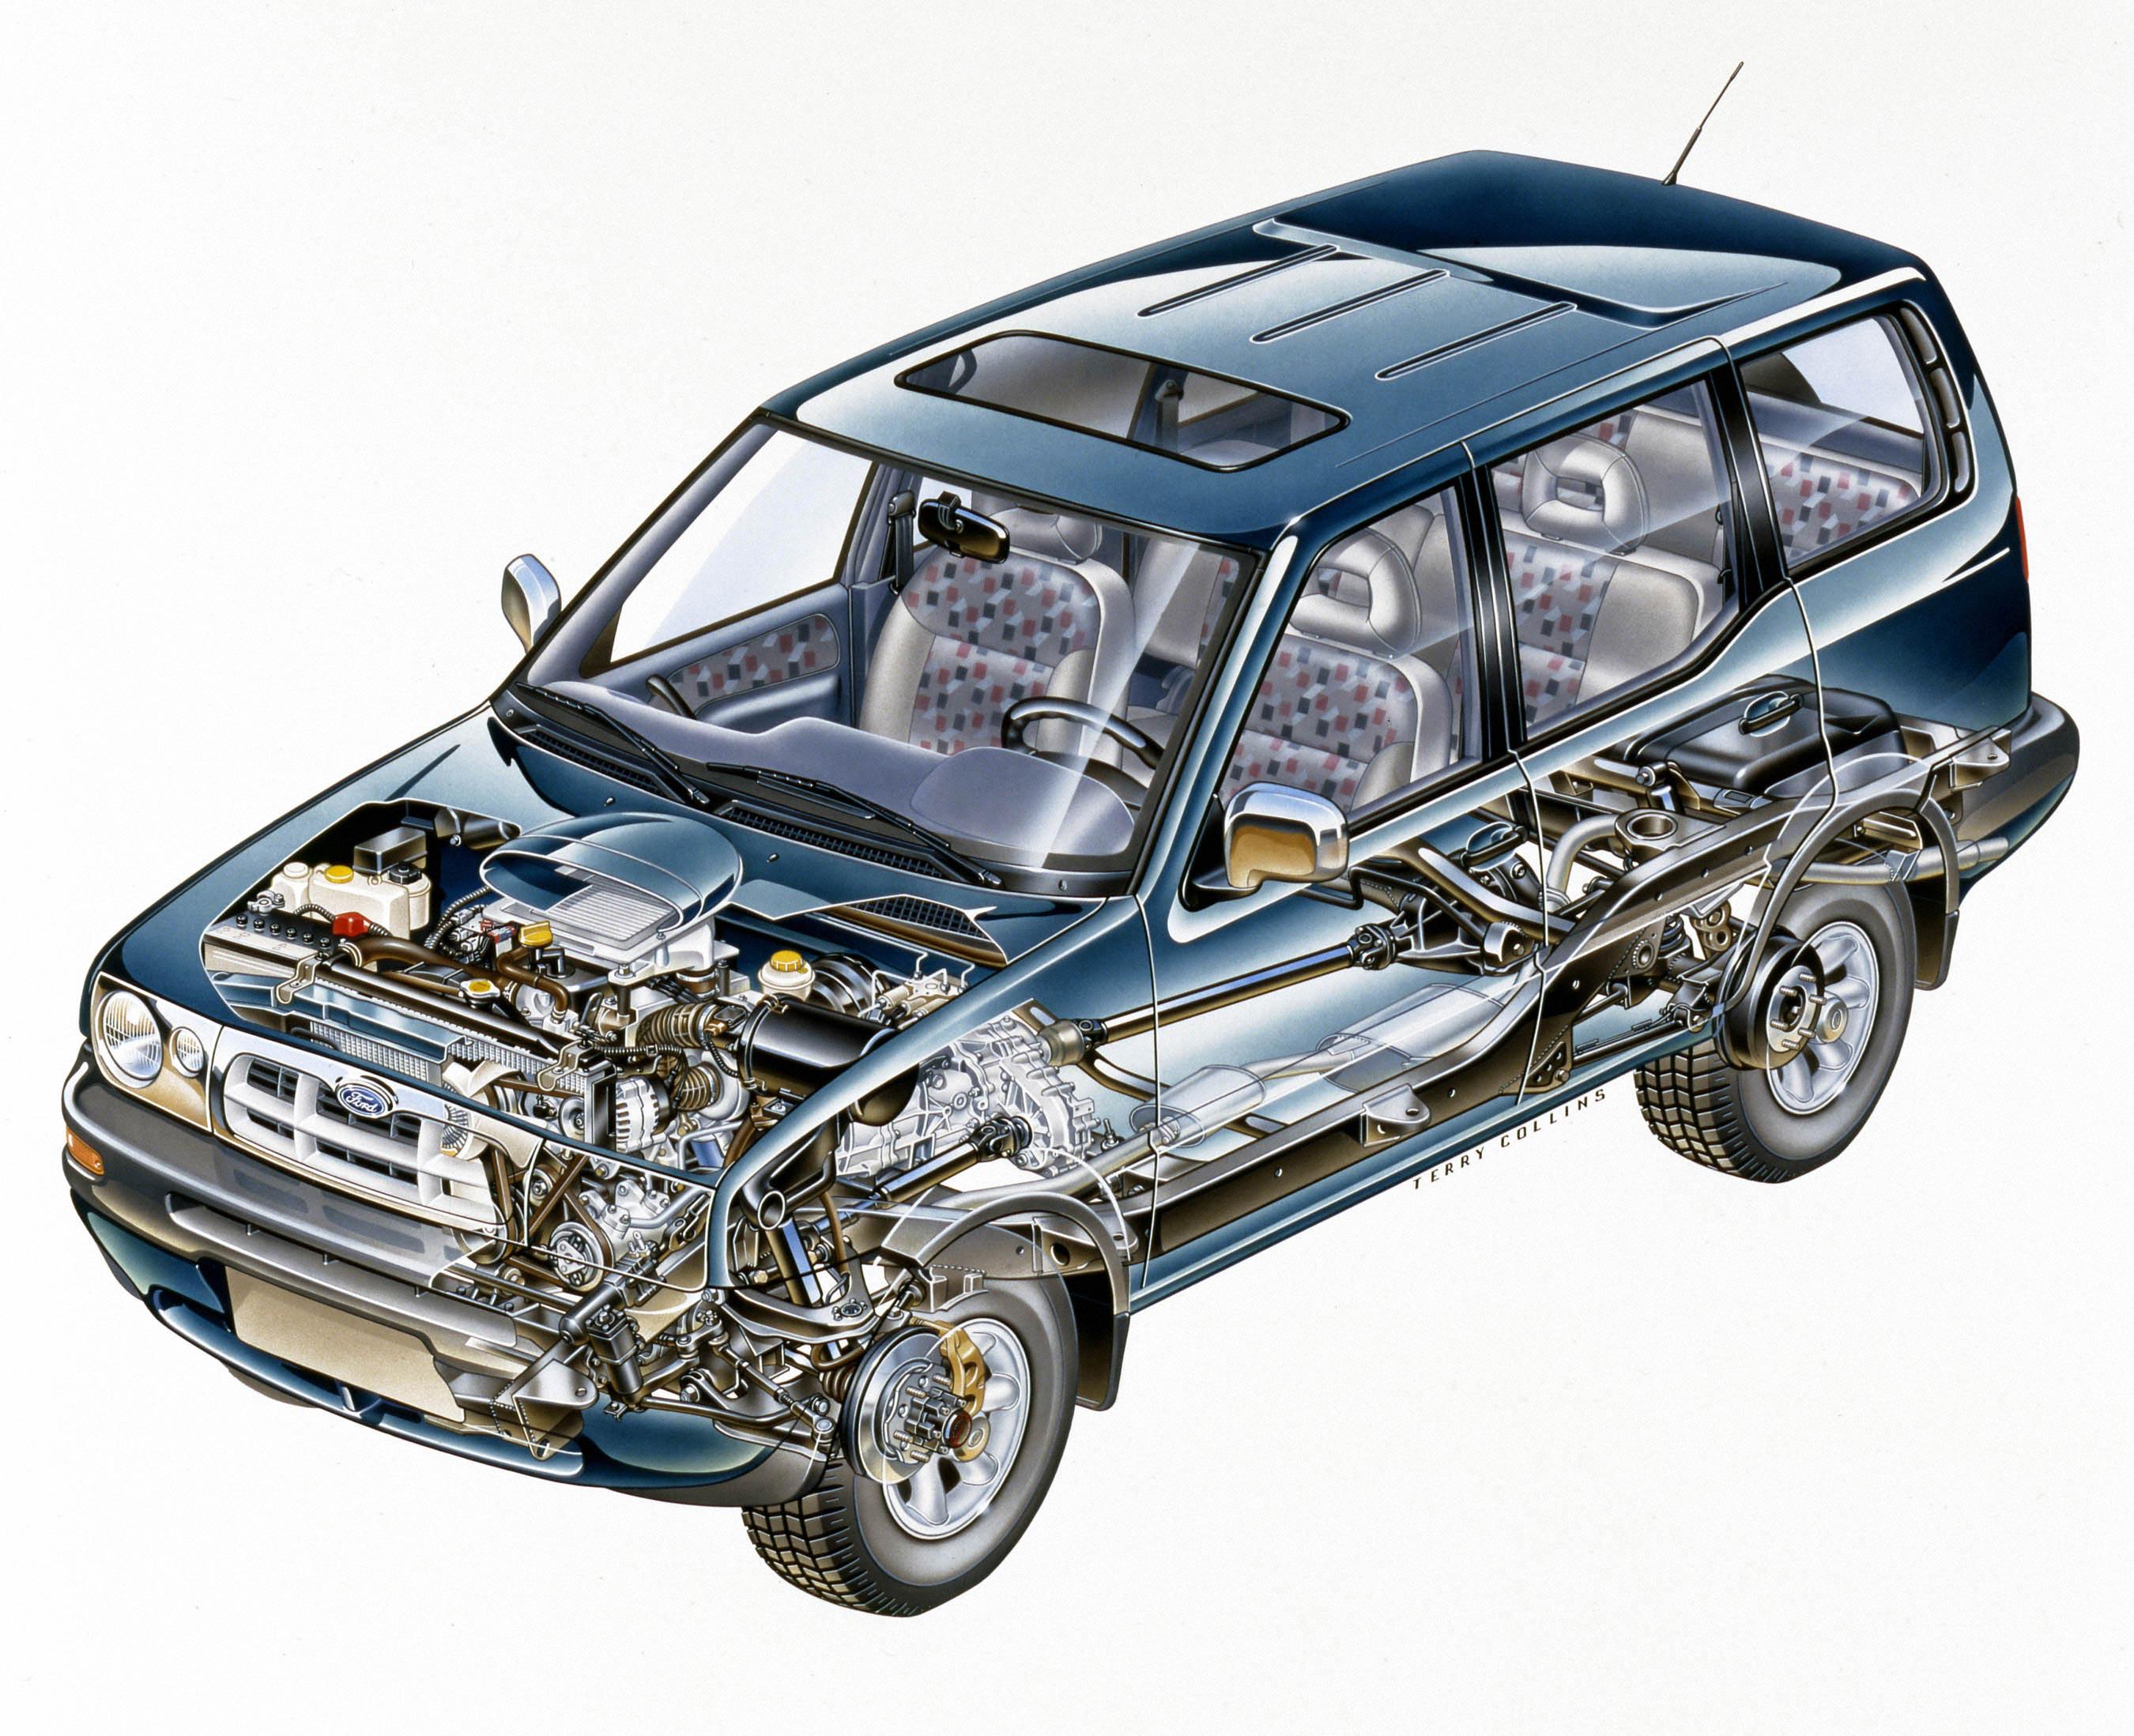 Ford Maverick cutaway drawing